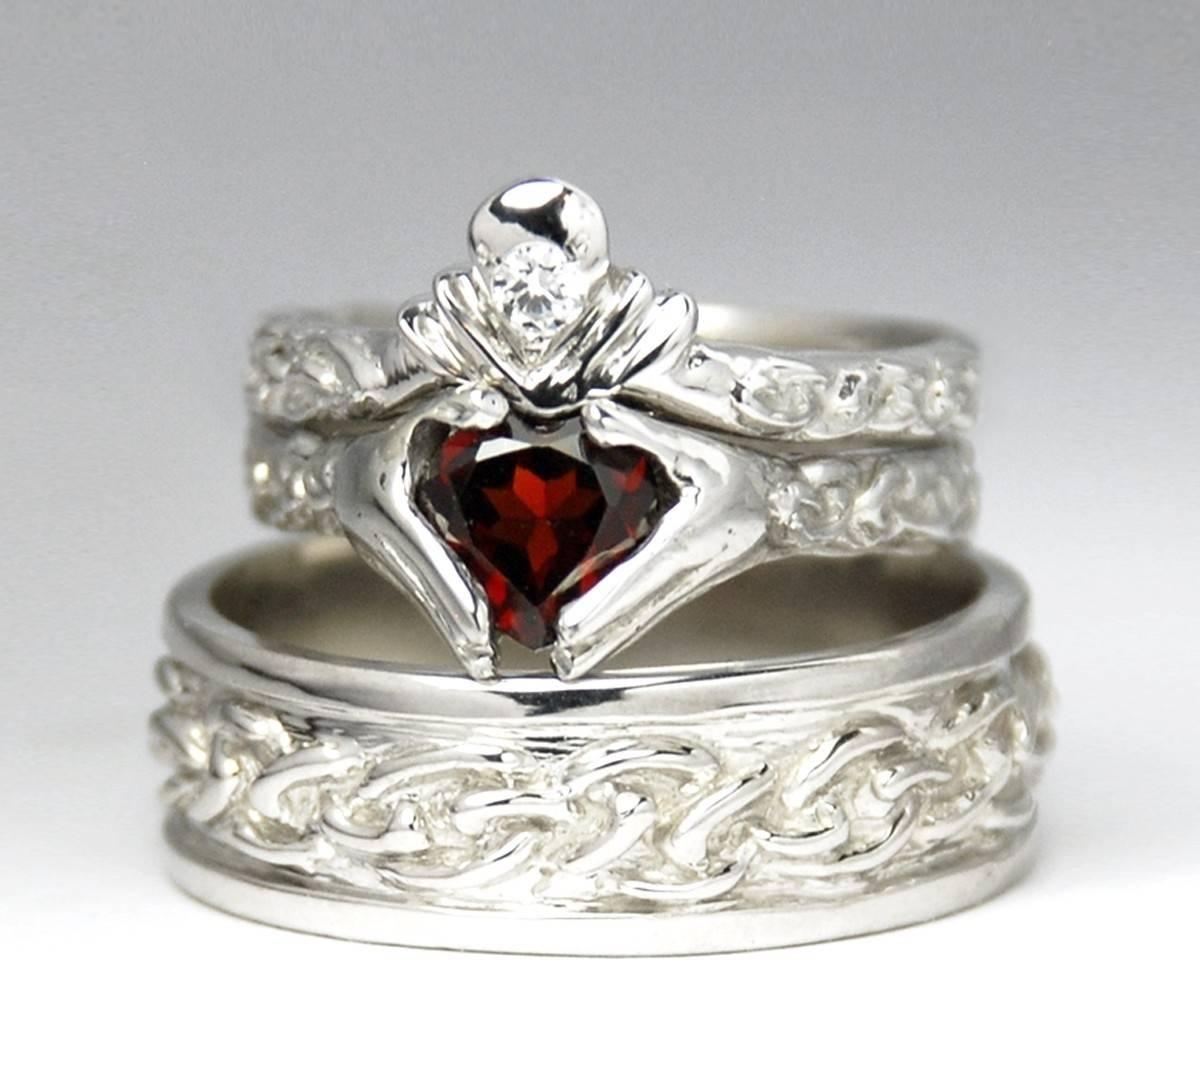 Scottish Wedding Bands — Memorable Wedding Planning Inside Traditional Scottish Engagement Rings (View 5 of 15)